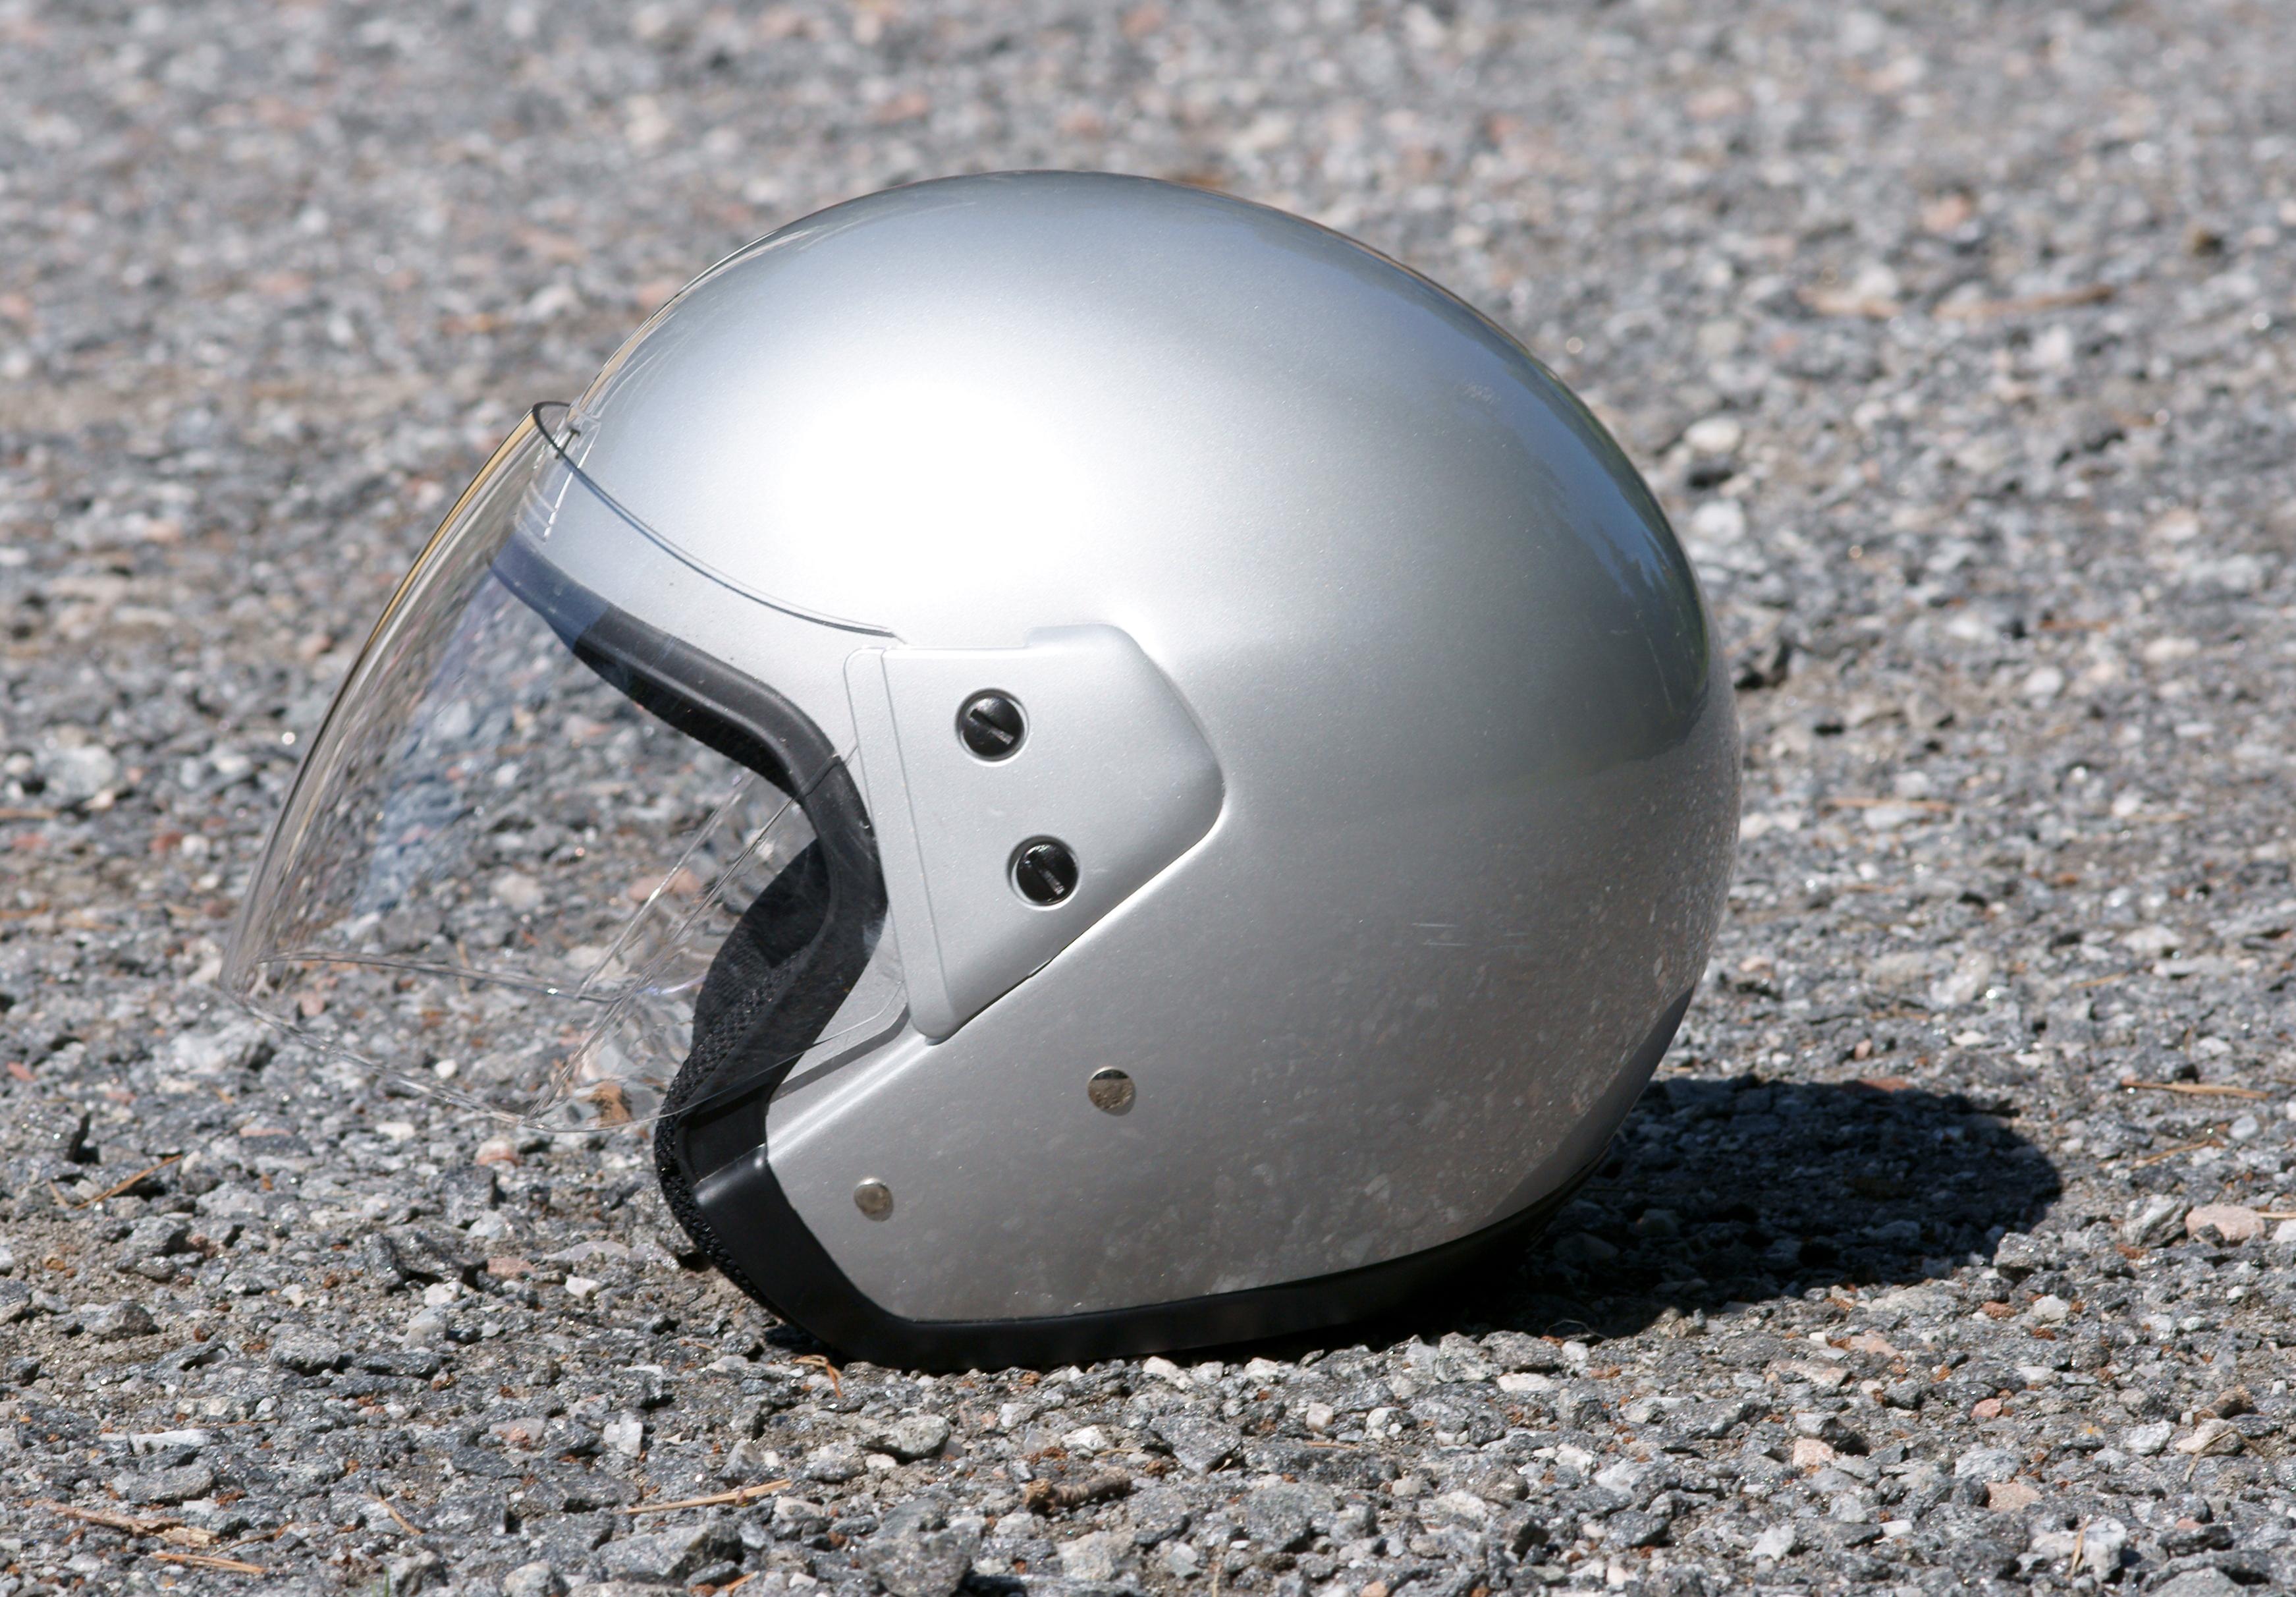 File:Open-face helmet.JPG - Wikimedia Commons